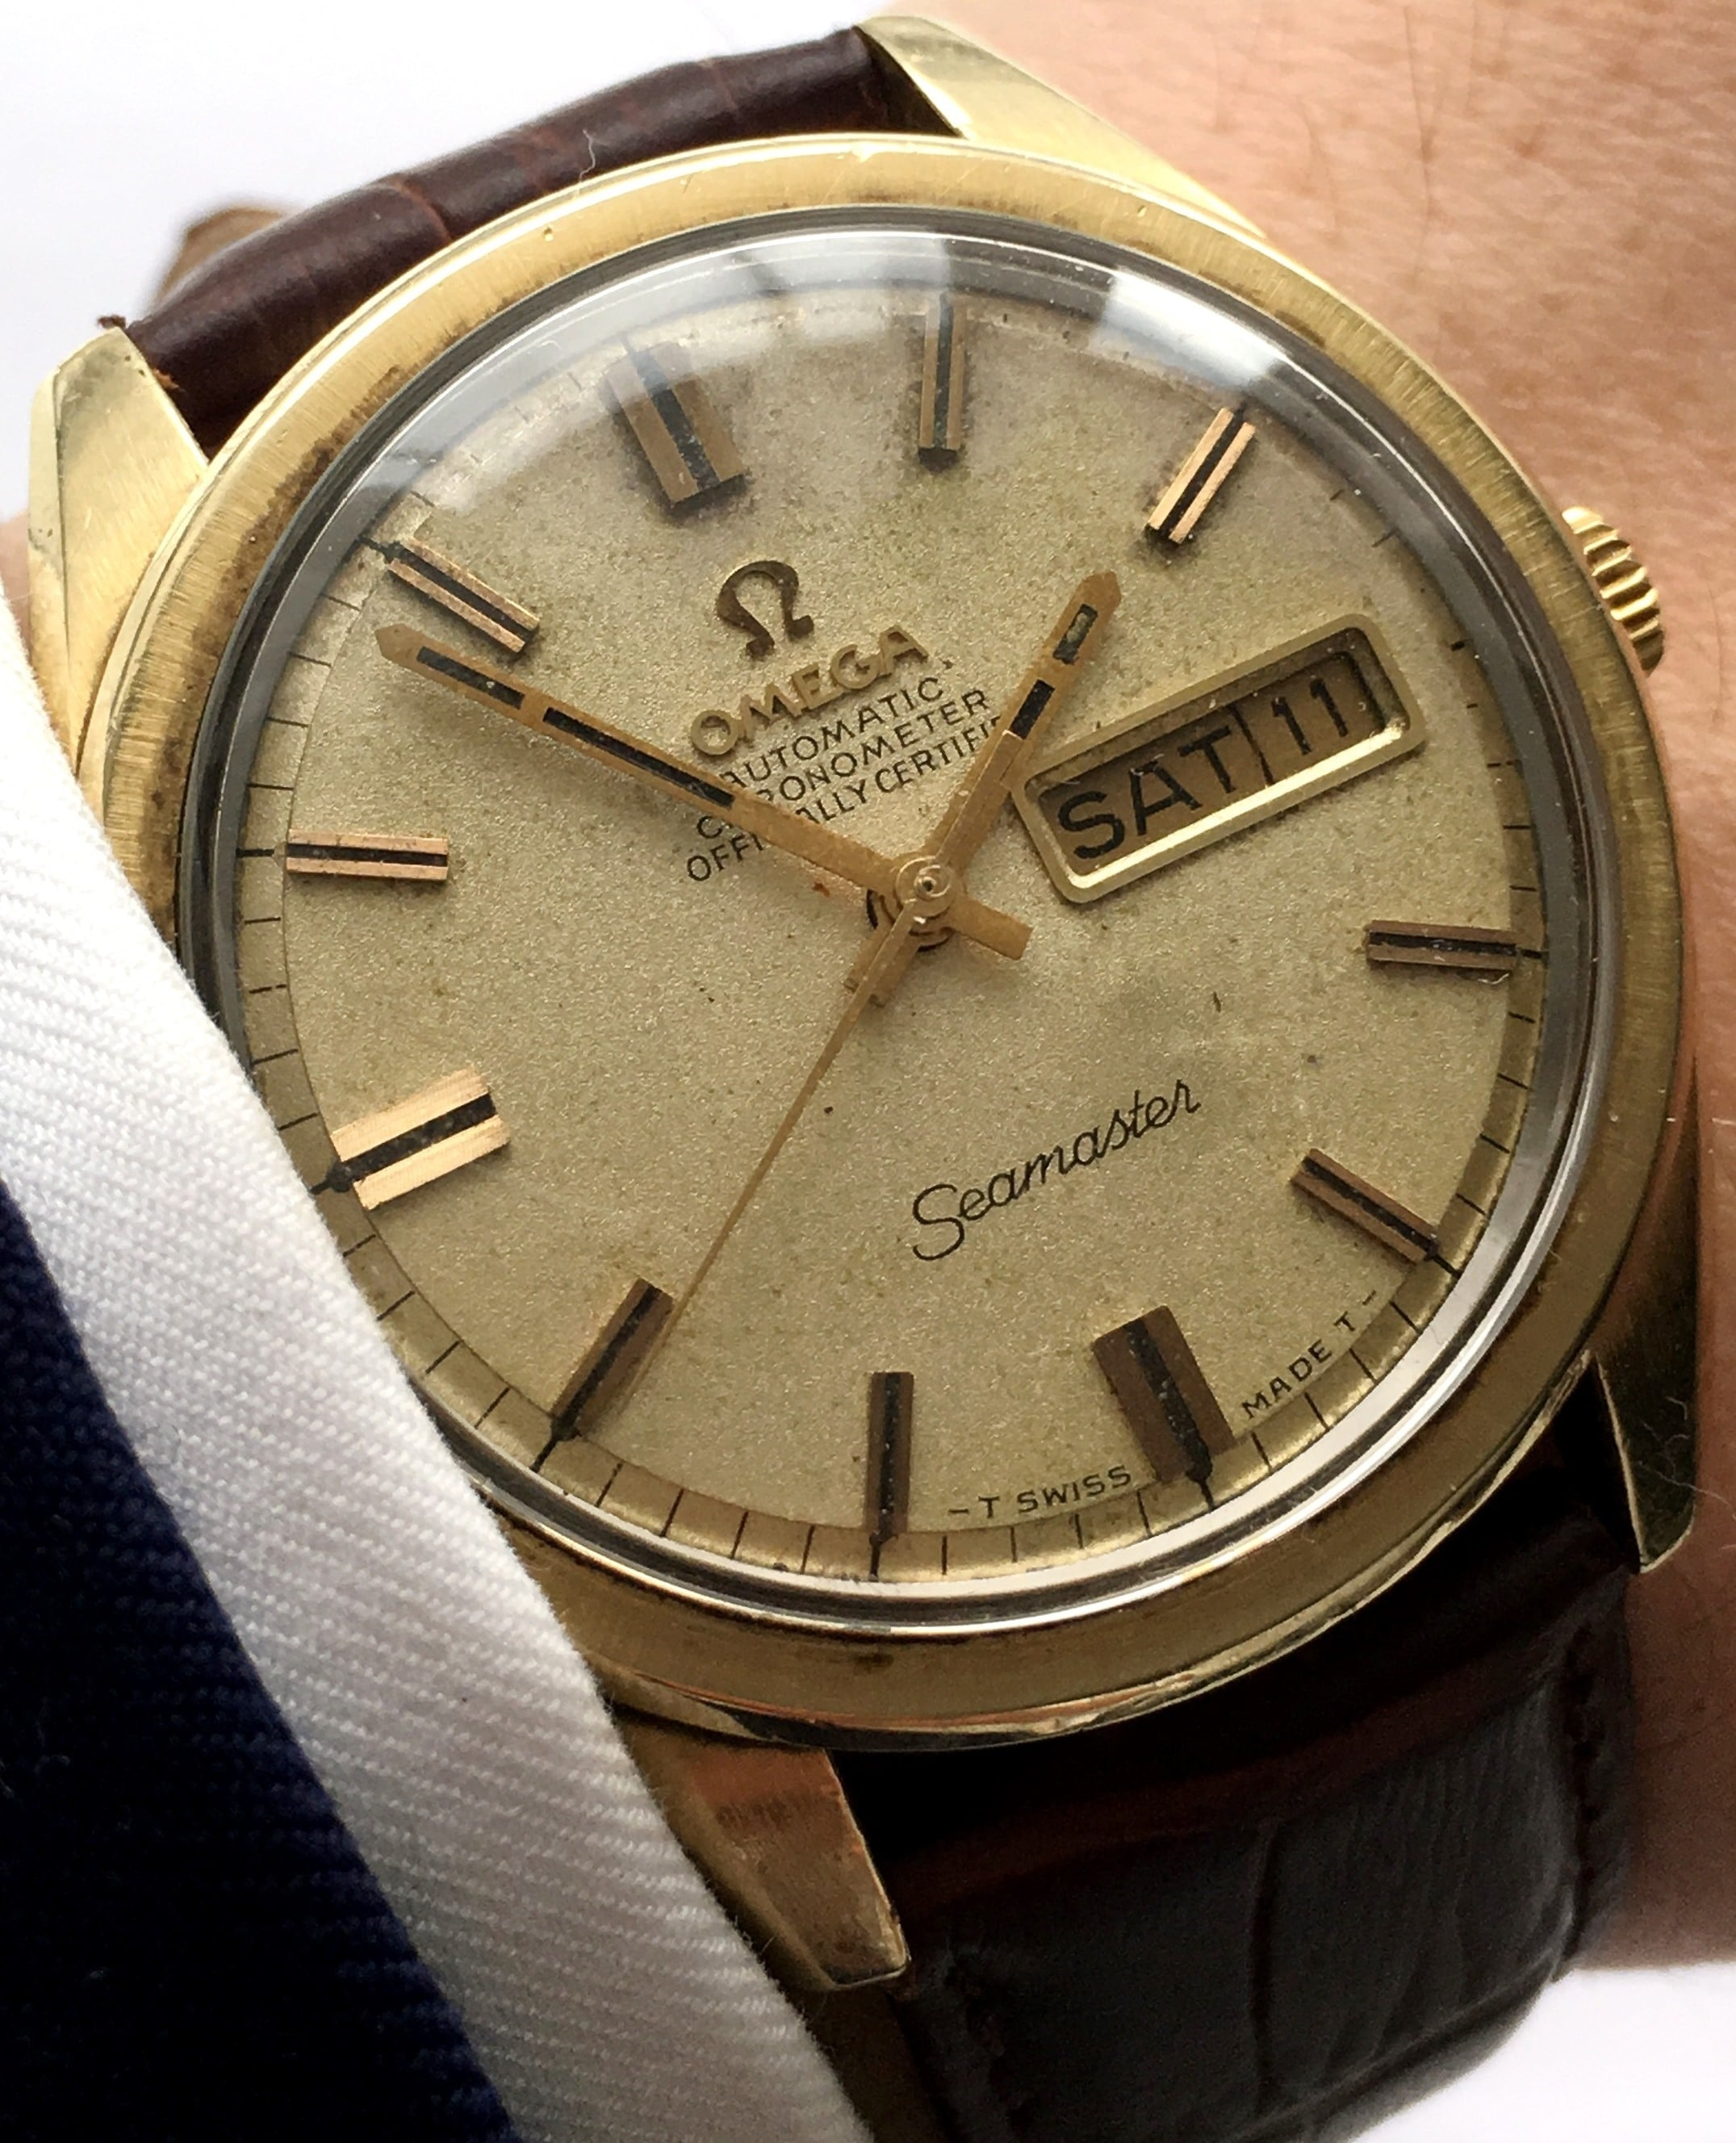 Omega Seamaster Chronometer Day Date Automatic - Vintage Portfolio 746fcc6d23